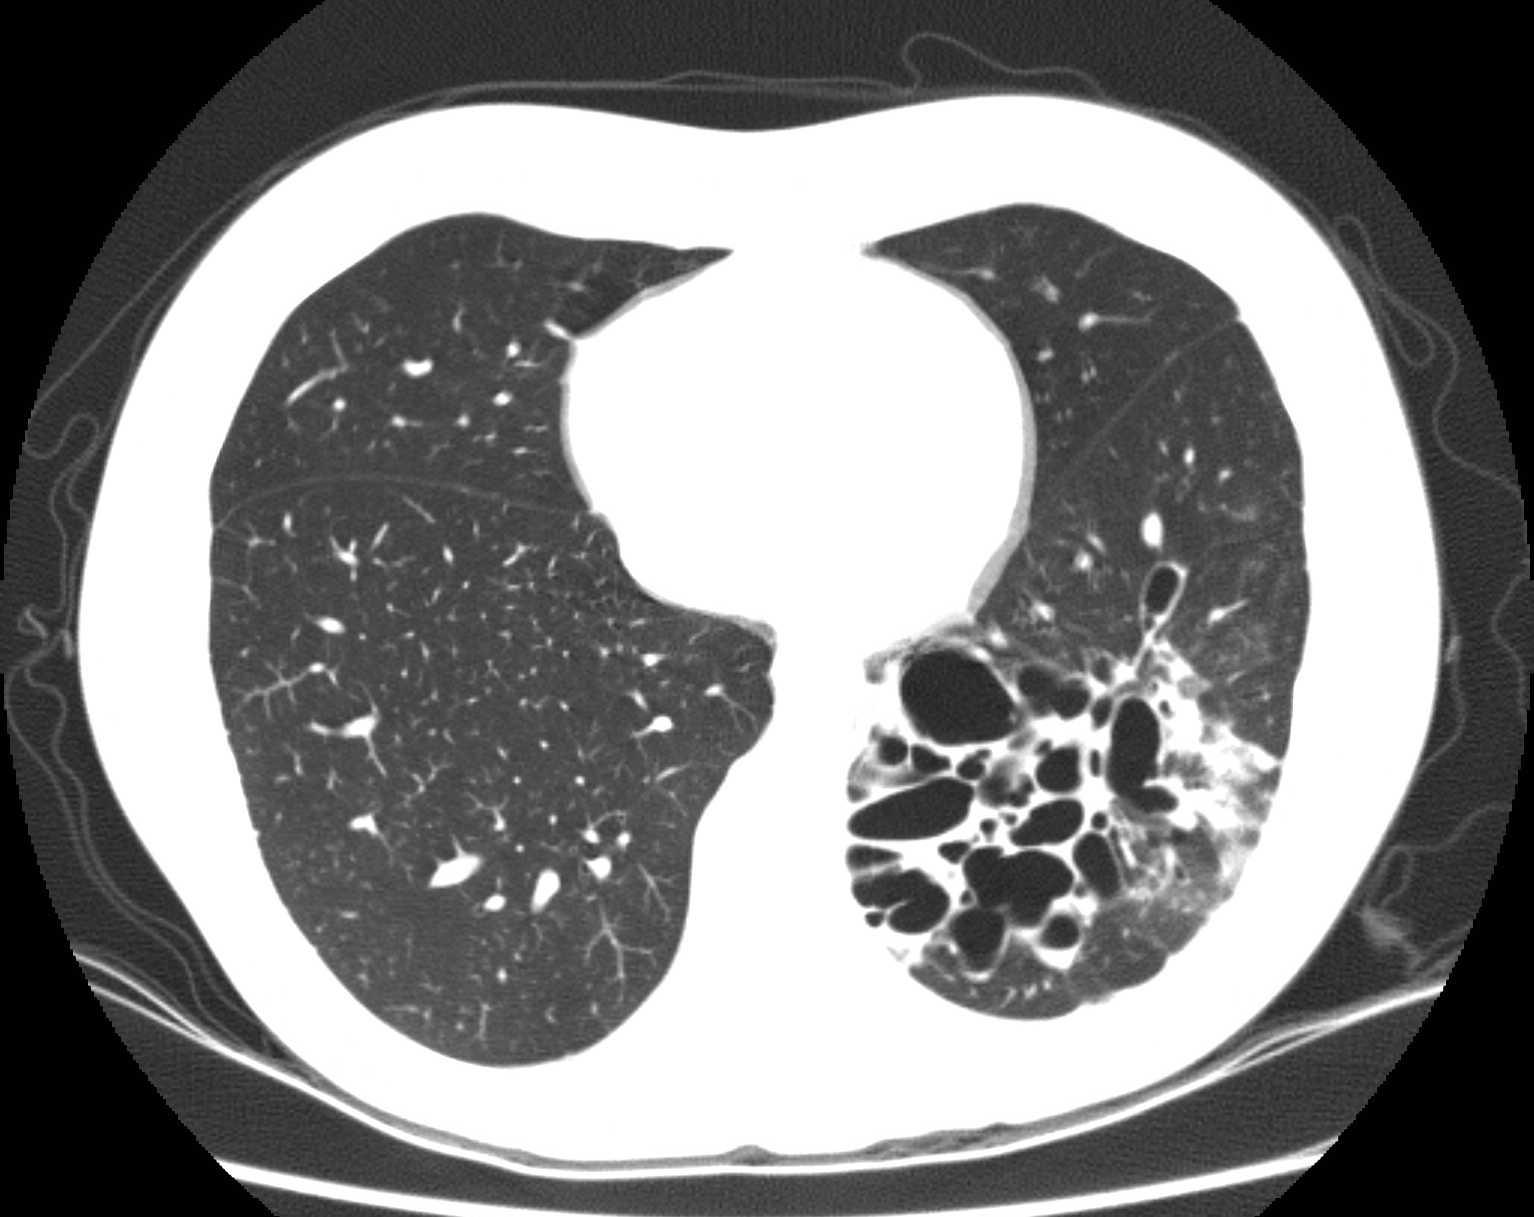 CT scan of bronchiectasis showing airway dilation (source)